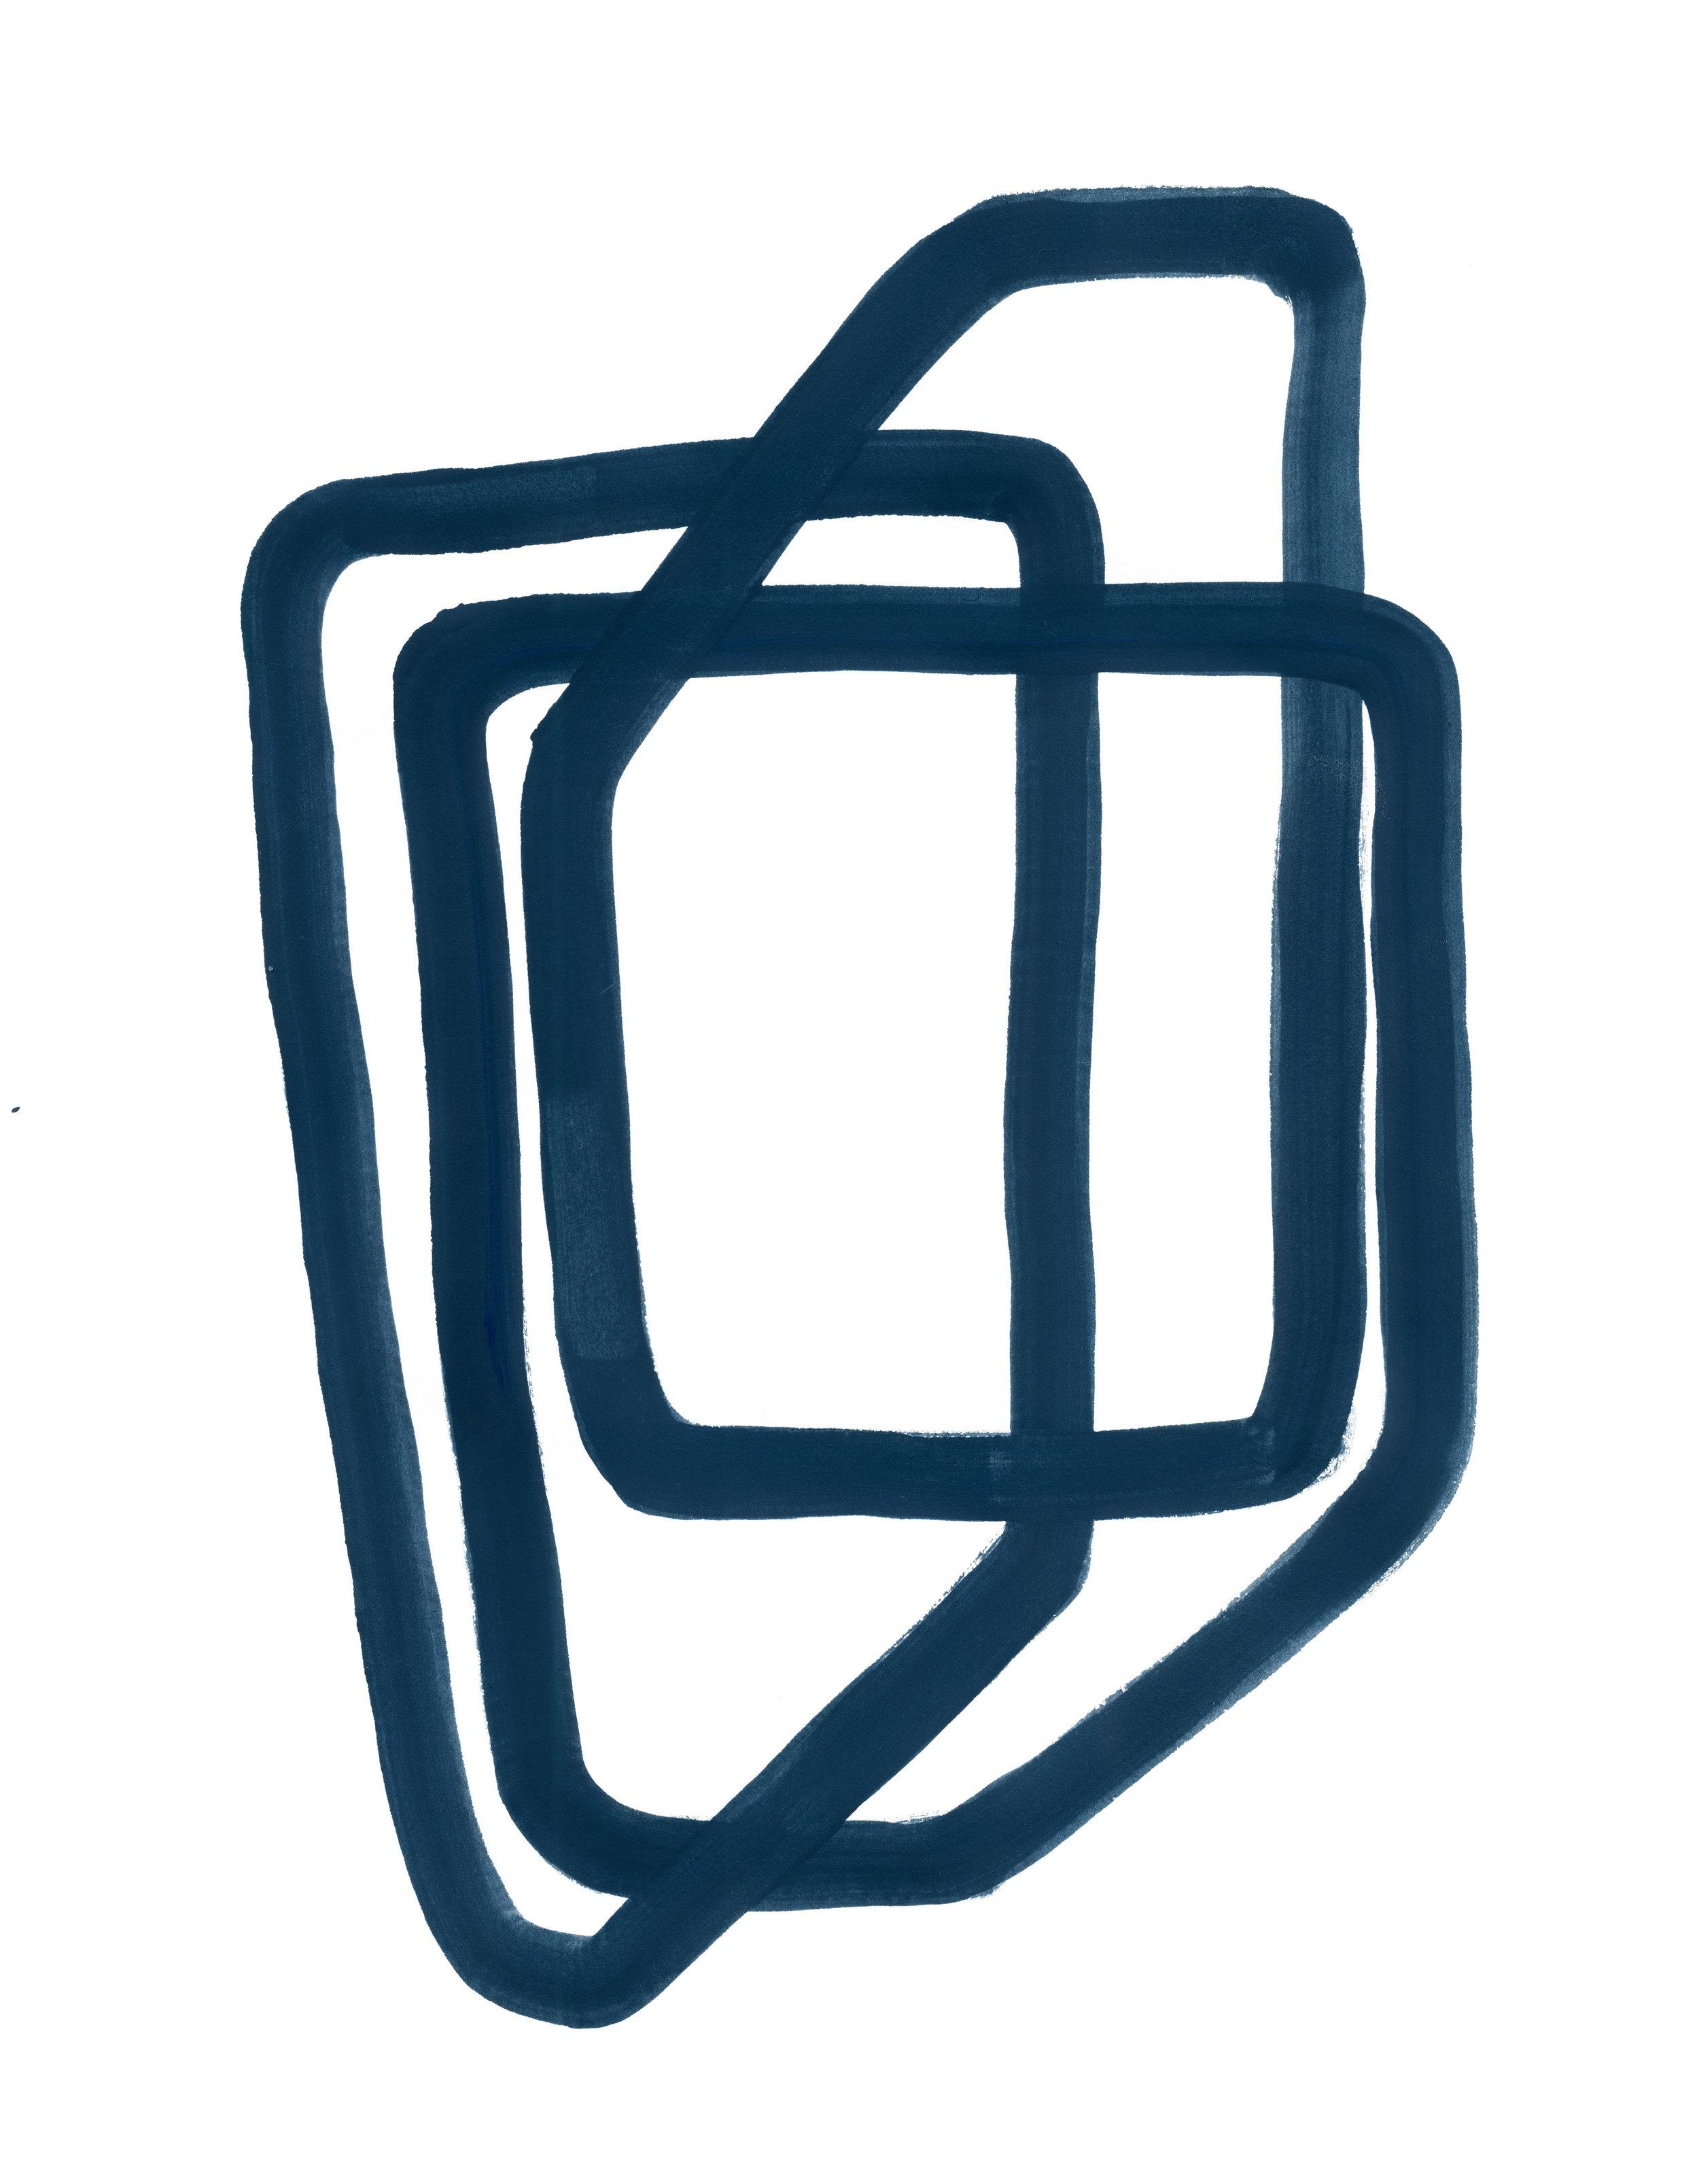 Threes-X.jpg